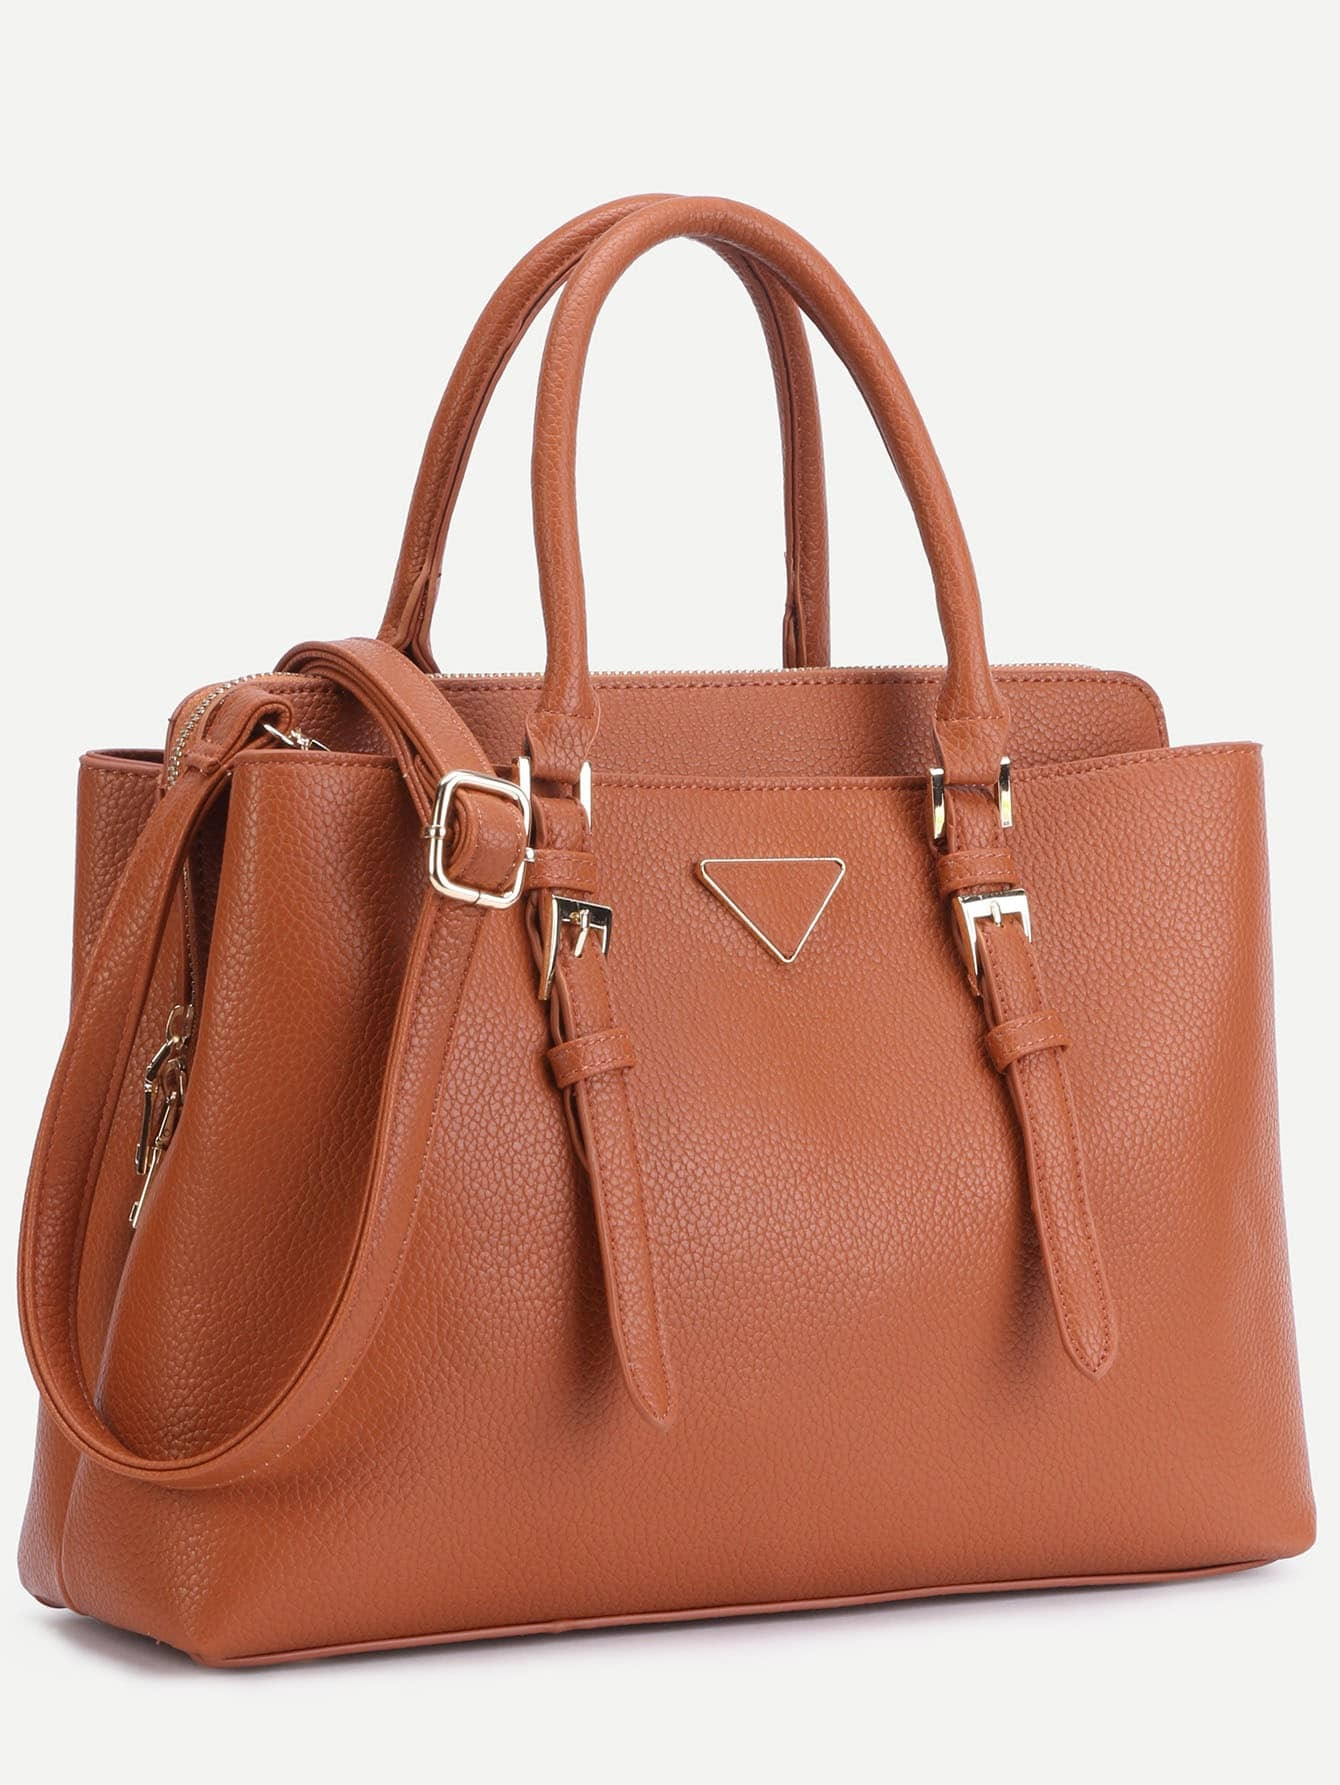 bag160926914_2